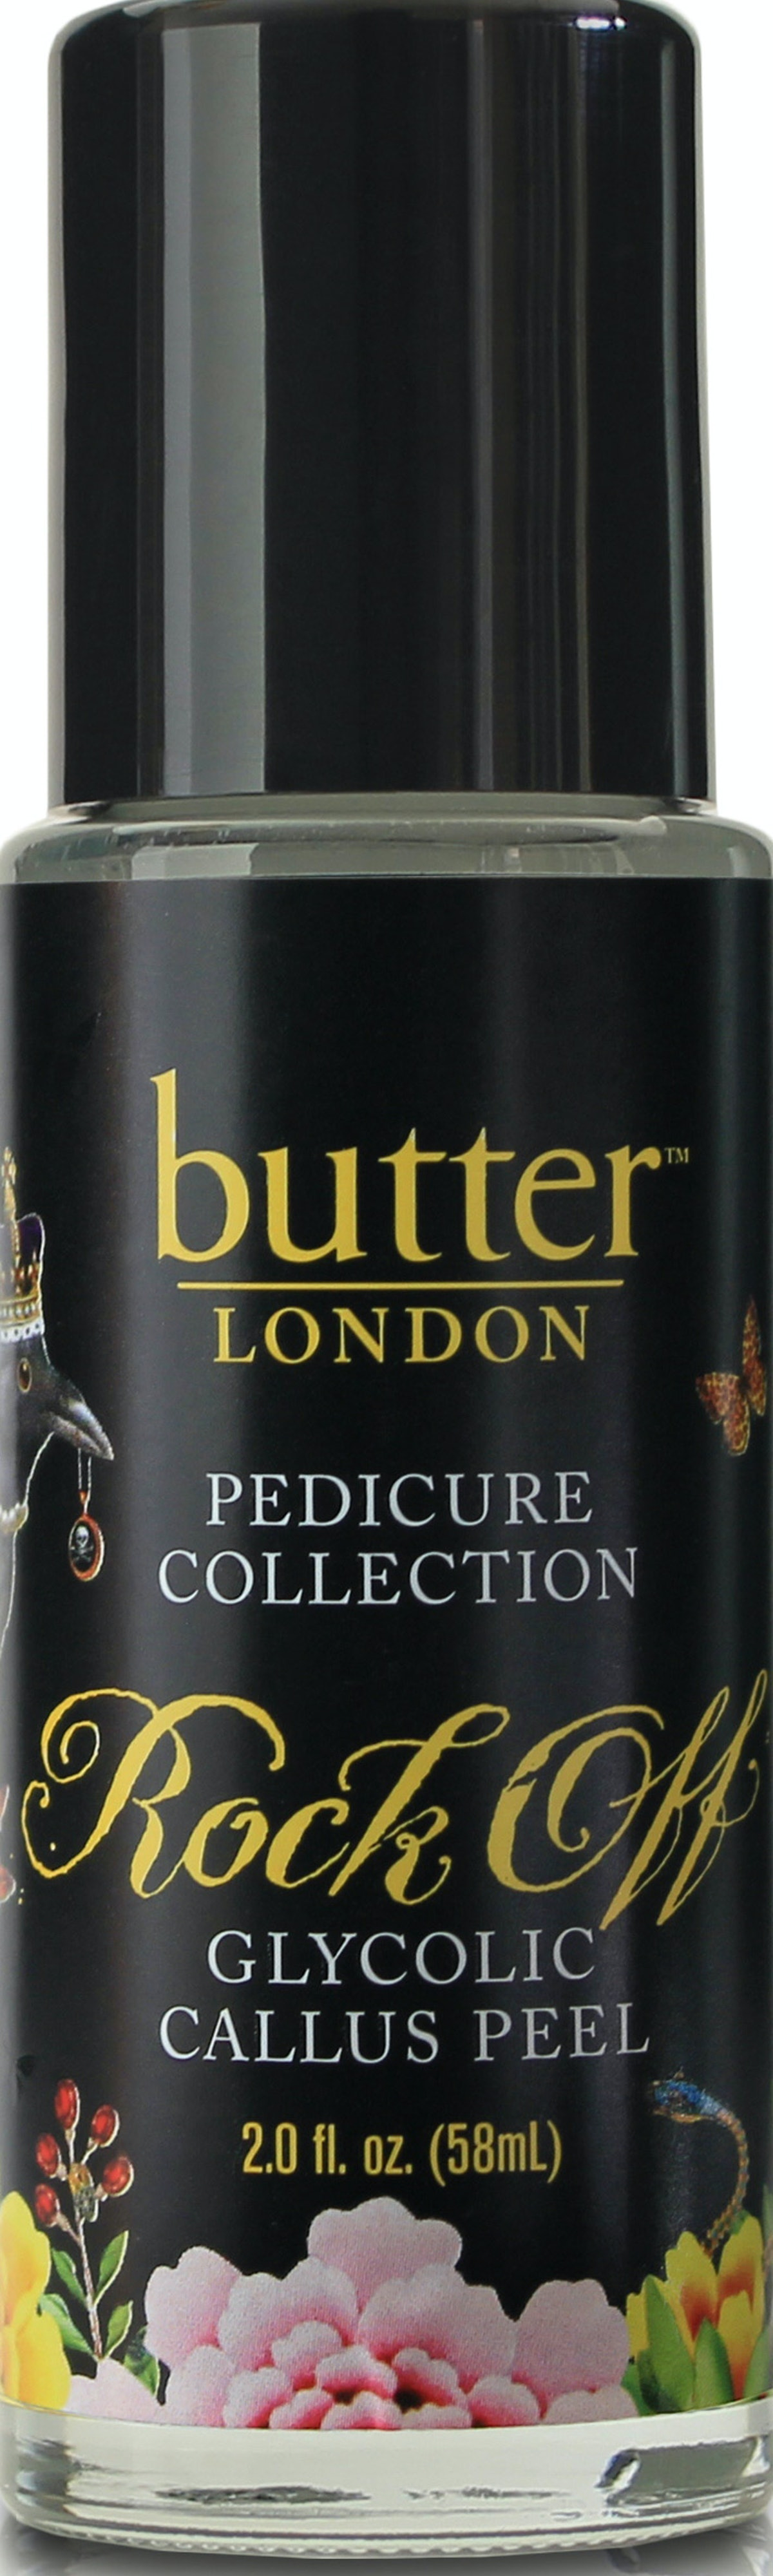 1--Butter-London-Rock-Off2013-01-15